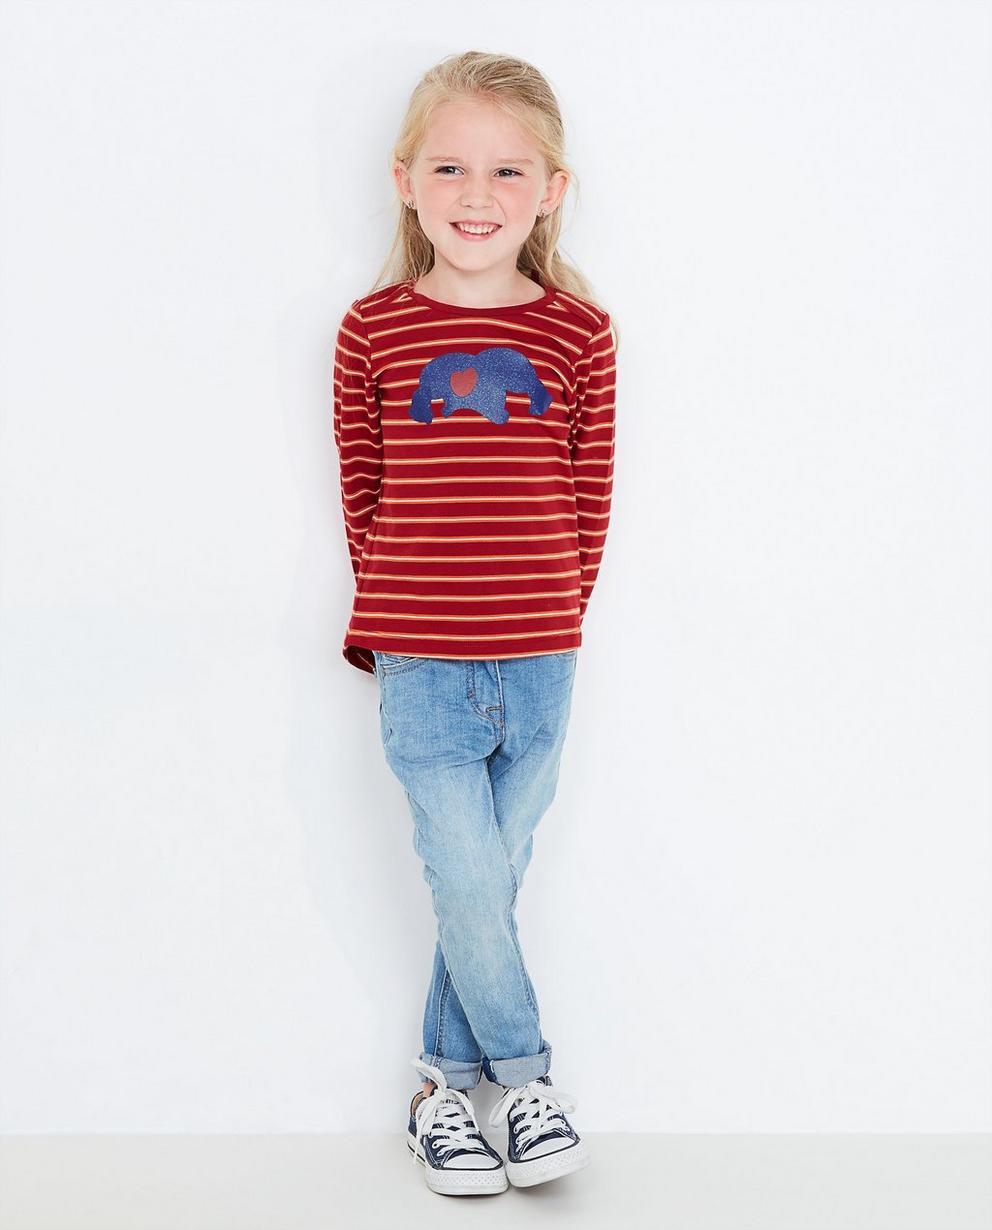 Verwassen skinny jeans - Plop - Plop